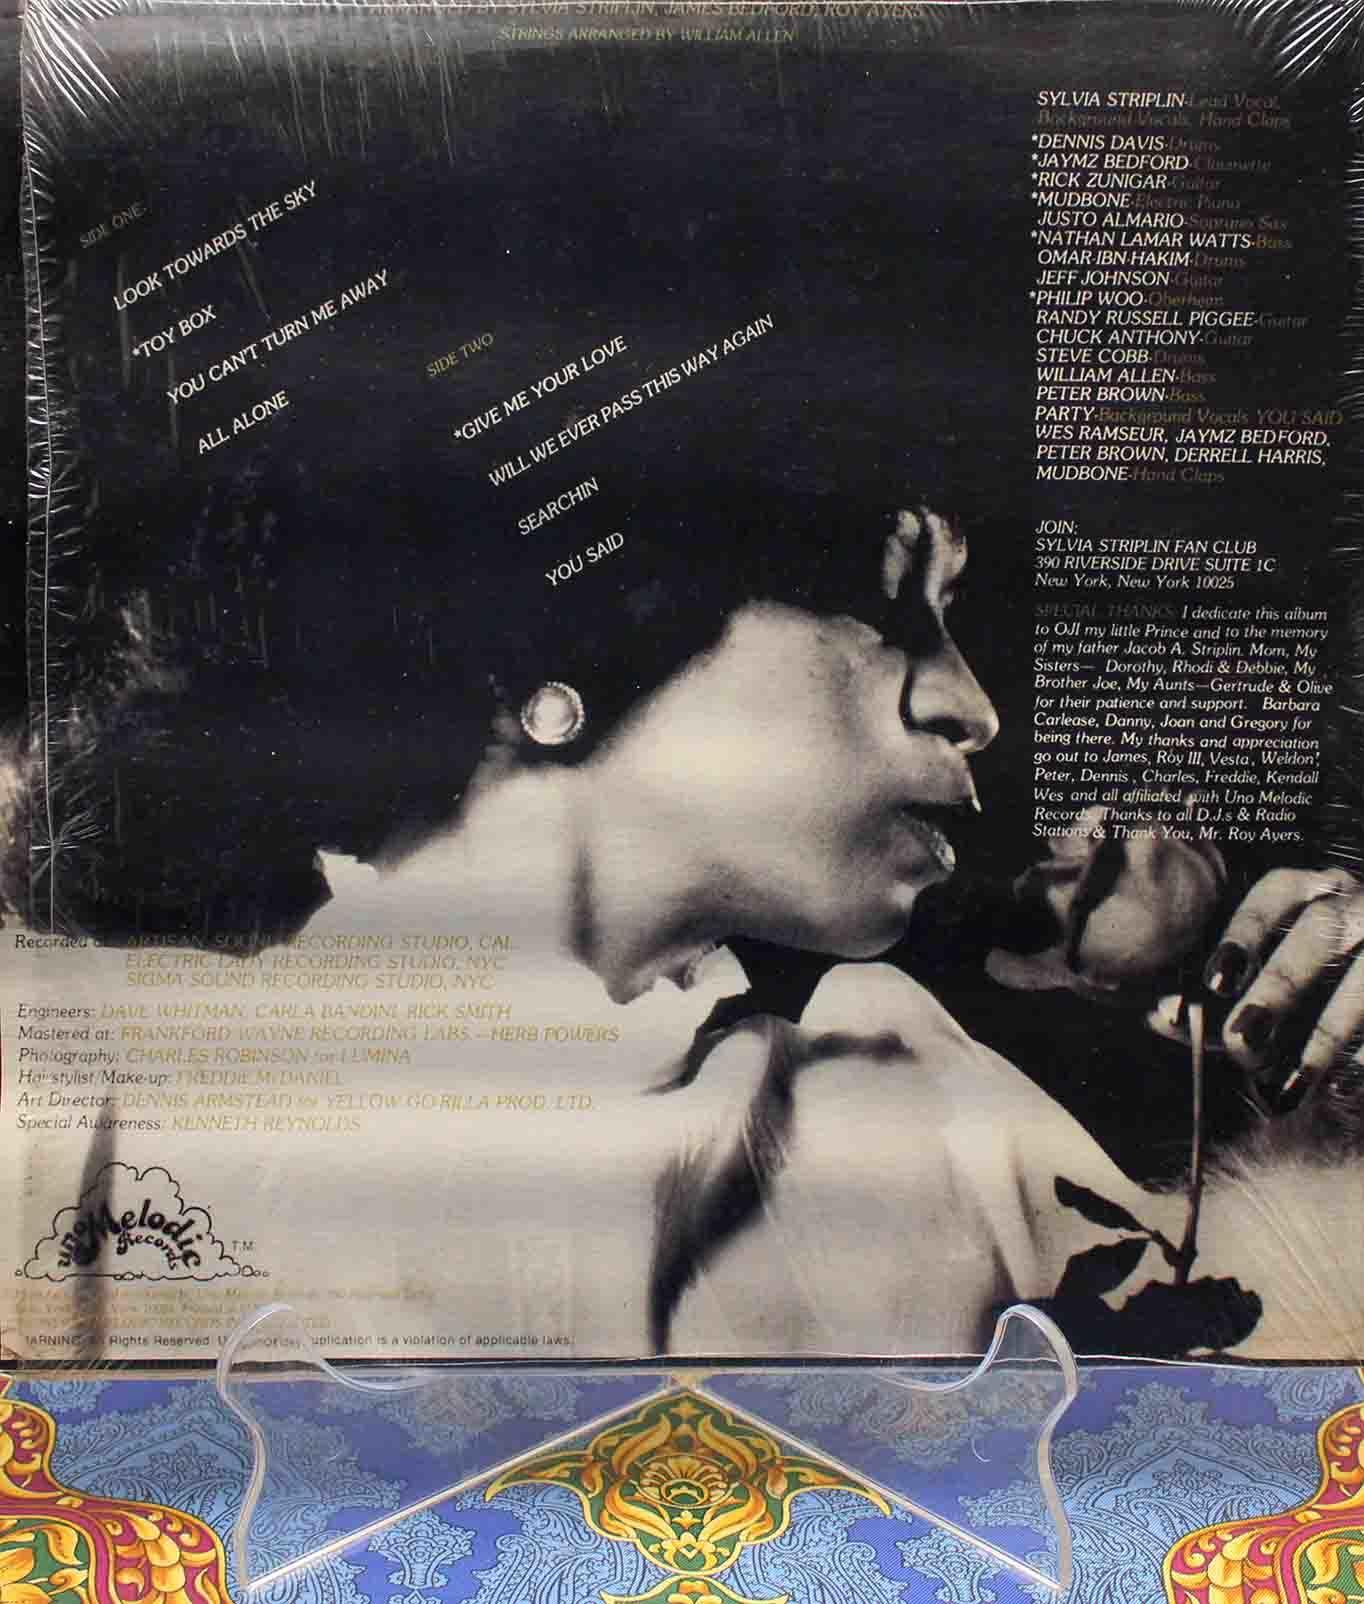 Sylvia Striplin – Give Me Your Love LP02